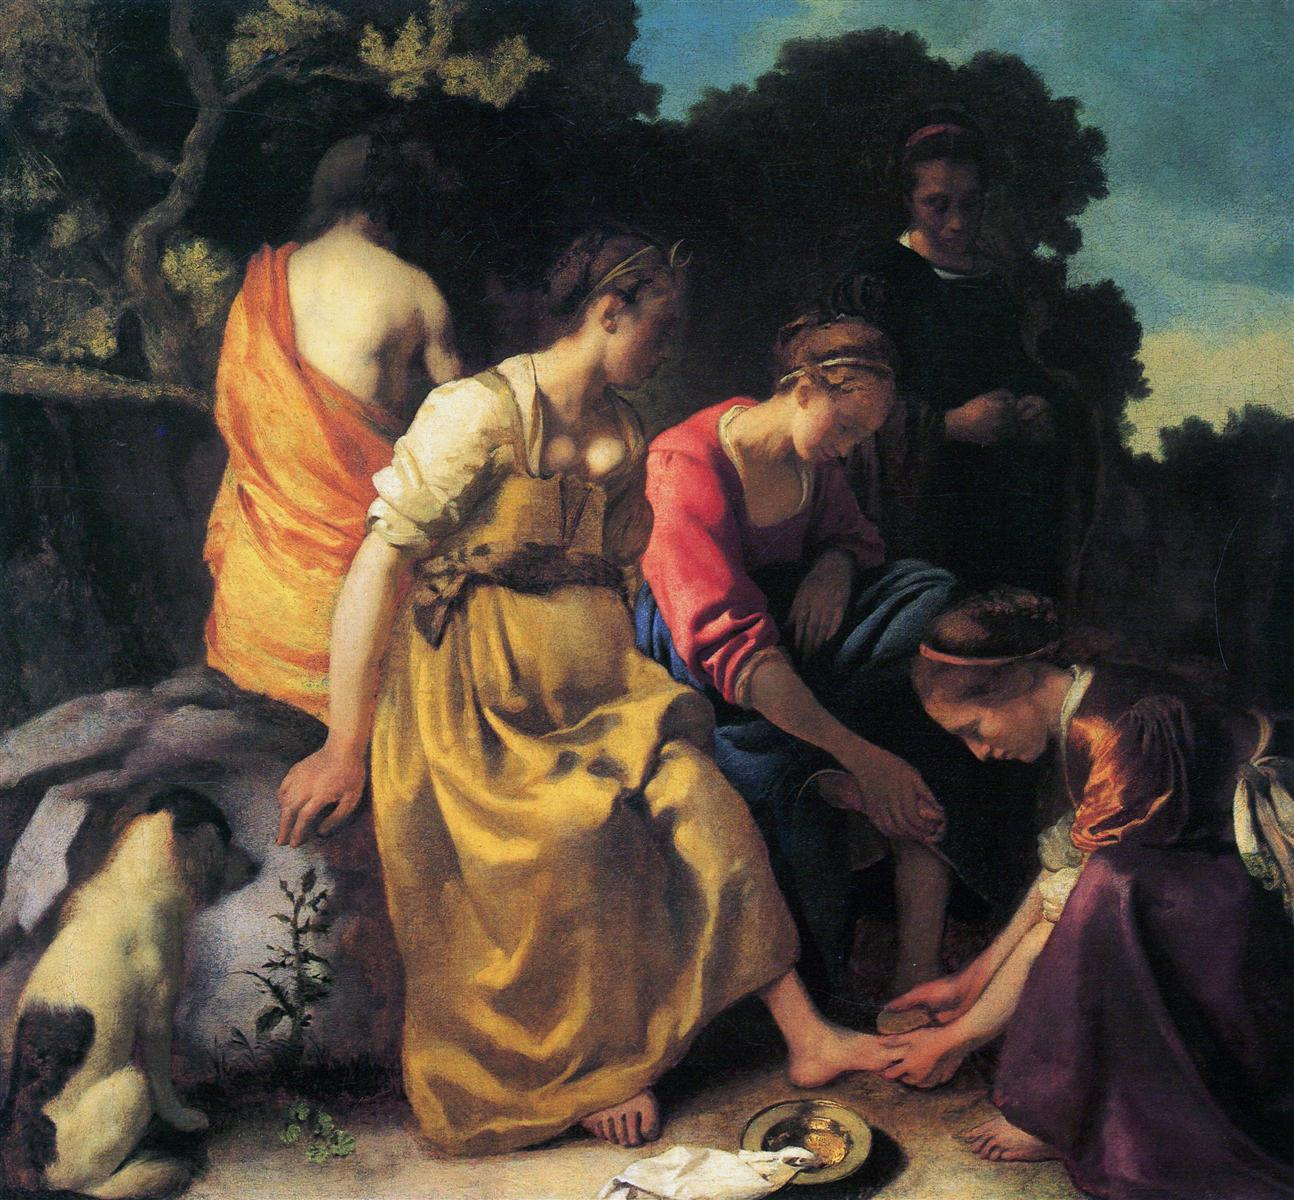 Diana and Her Companions, Johannes Vermeer, 1654